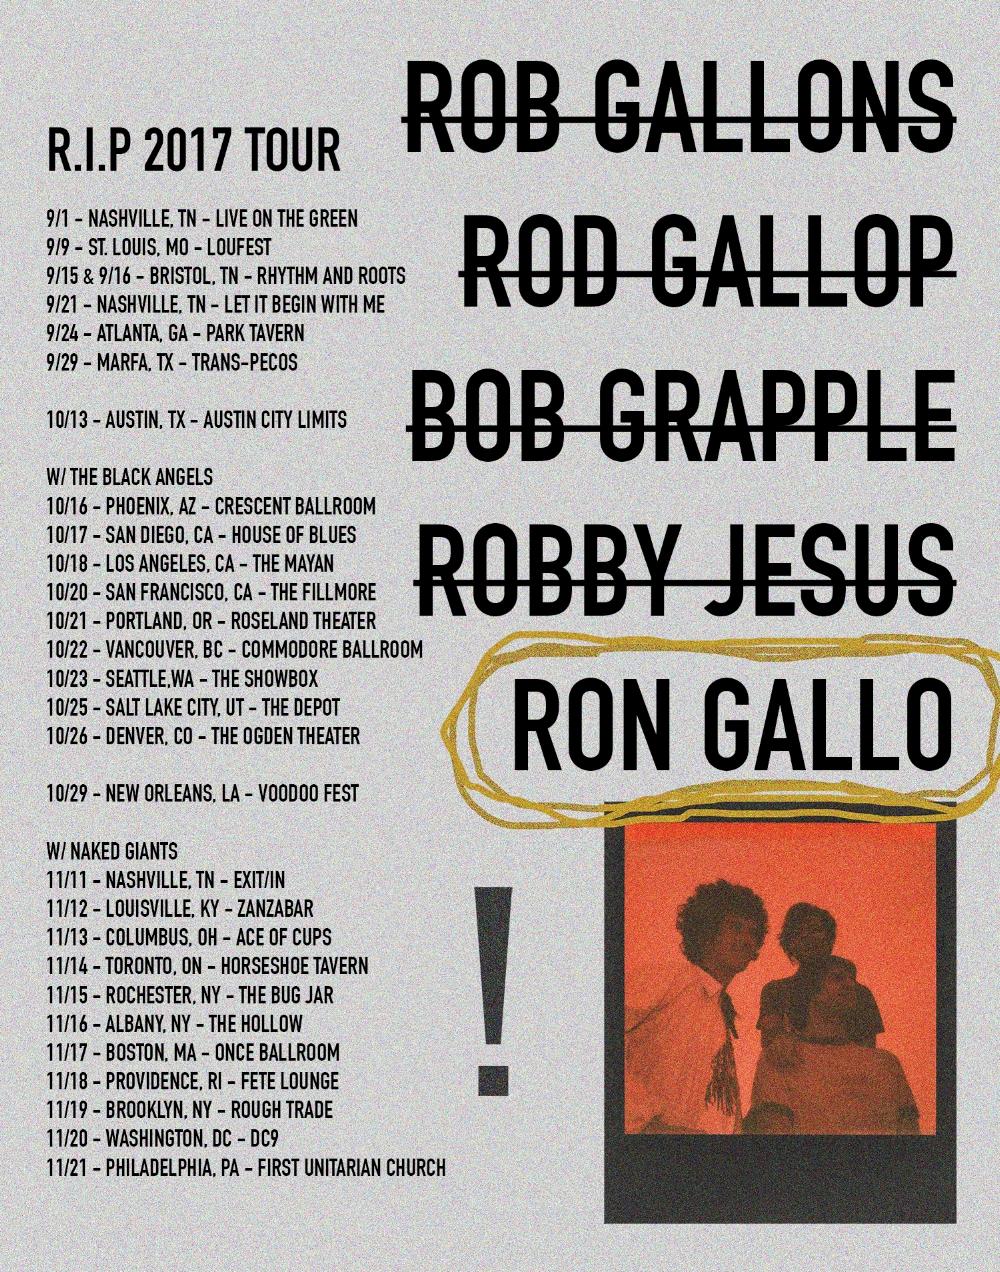 rip2017tour.jpg